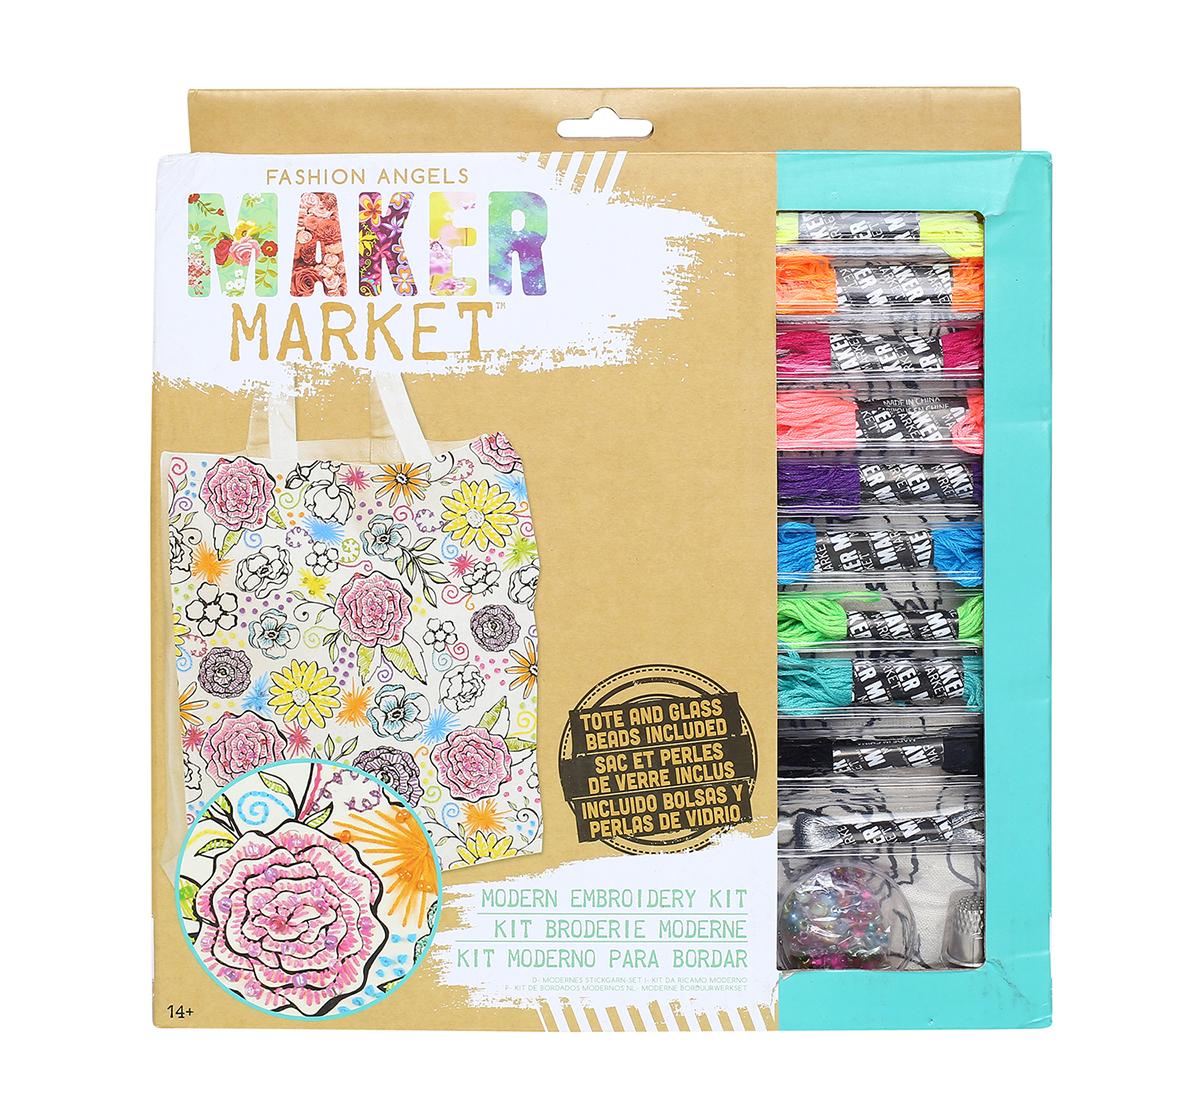 Fashion Angels    Fashion Angels Enterprises Maker Market Modern Embroidery Kit DIY Art & Craft Kits for Kids age 14Y+